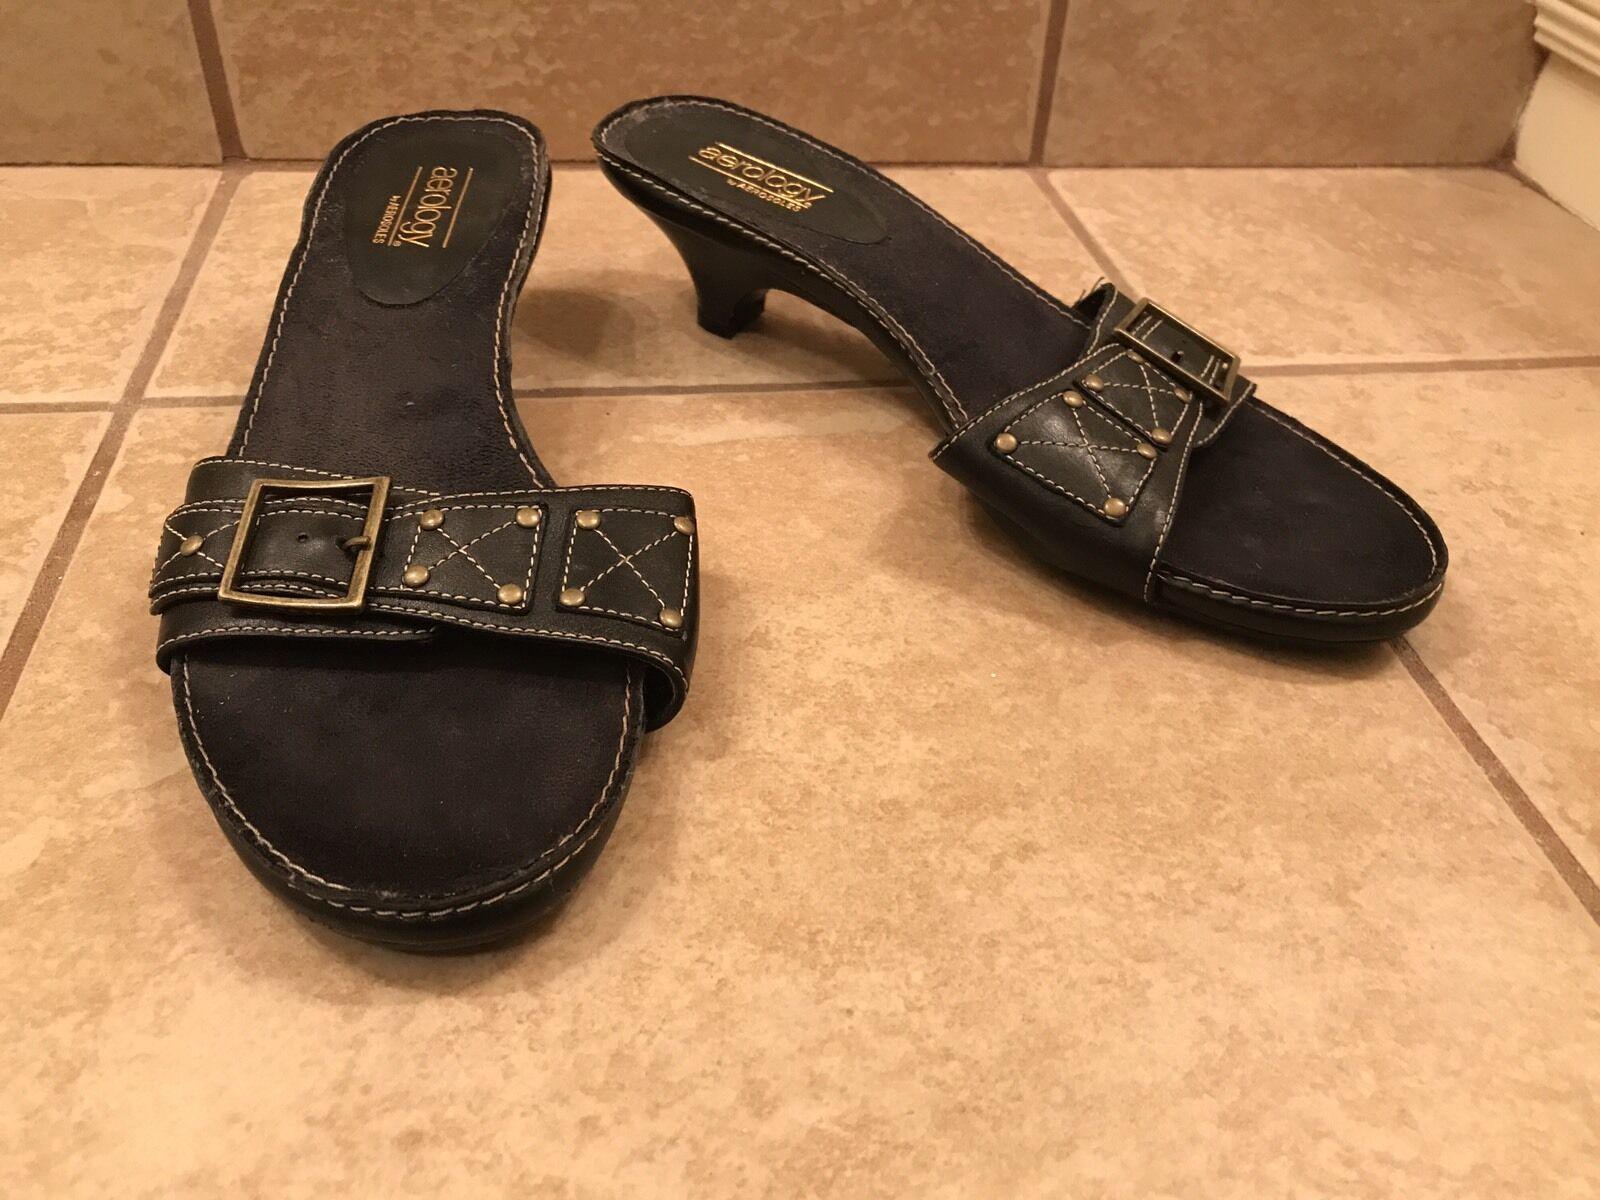 Aerology Sandals by Aerosoles Black Leather Sandals Aerology Shoes Slides 8.5 14c0a6